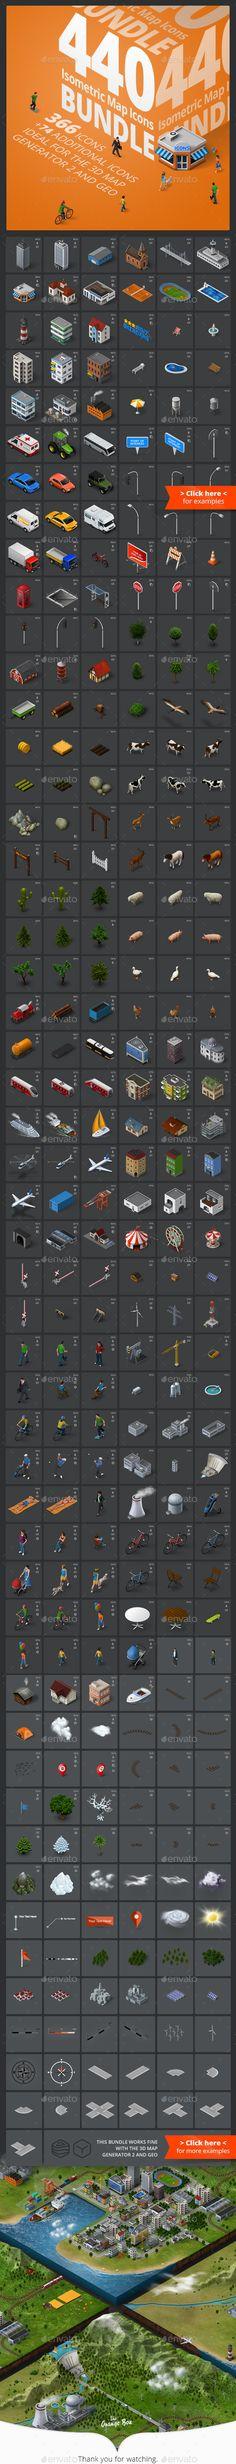 Isometric Map Icons - Bundle #design Download: http://graphicriver.net/item/isometric-map-icons-bundle/13742256?ref=ksioks